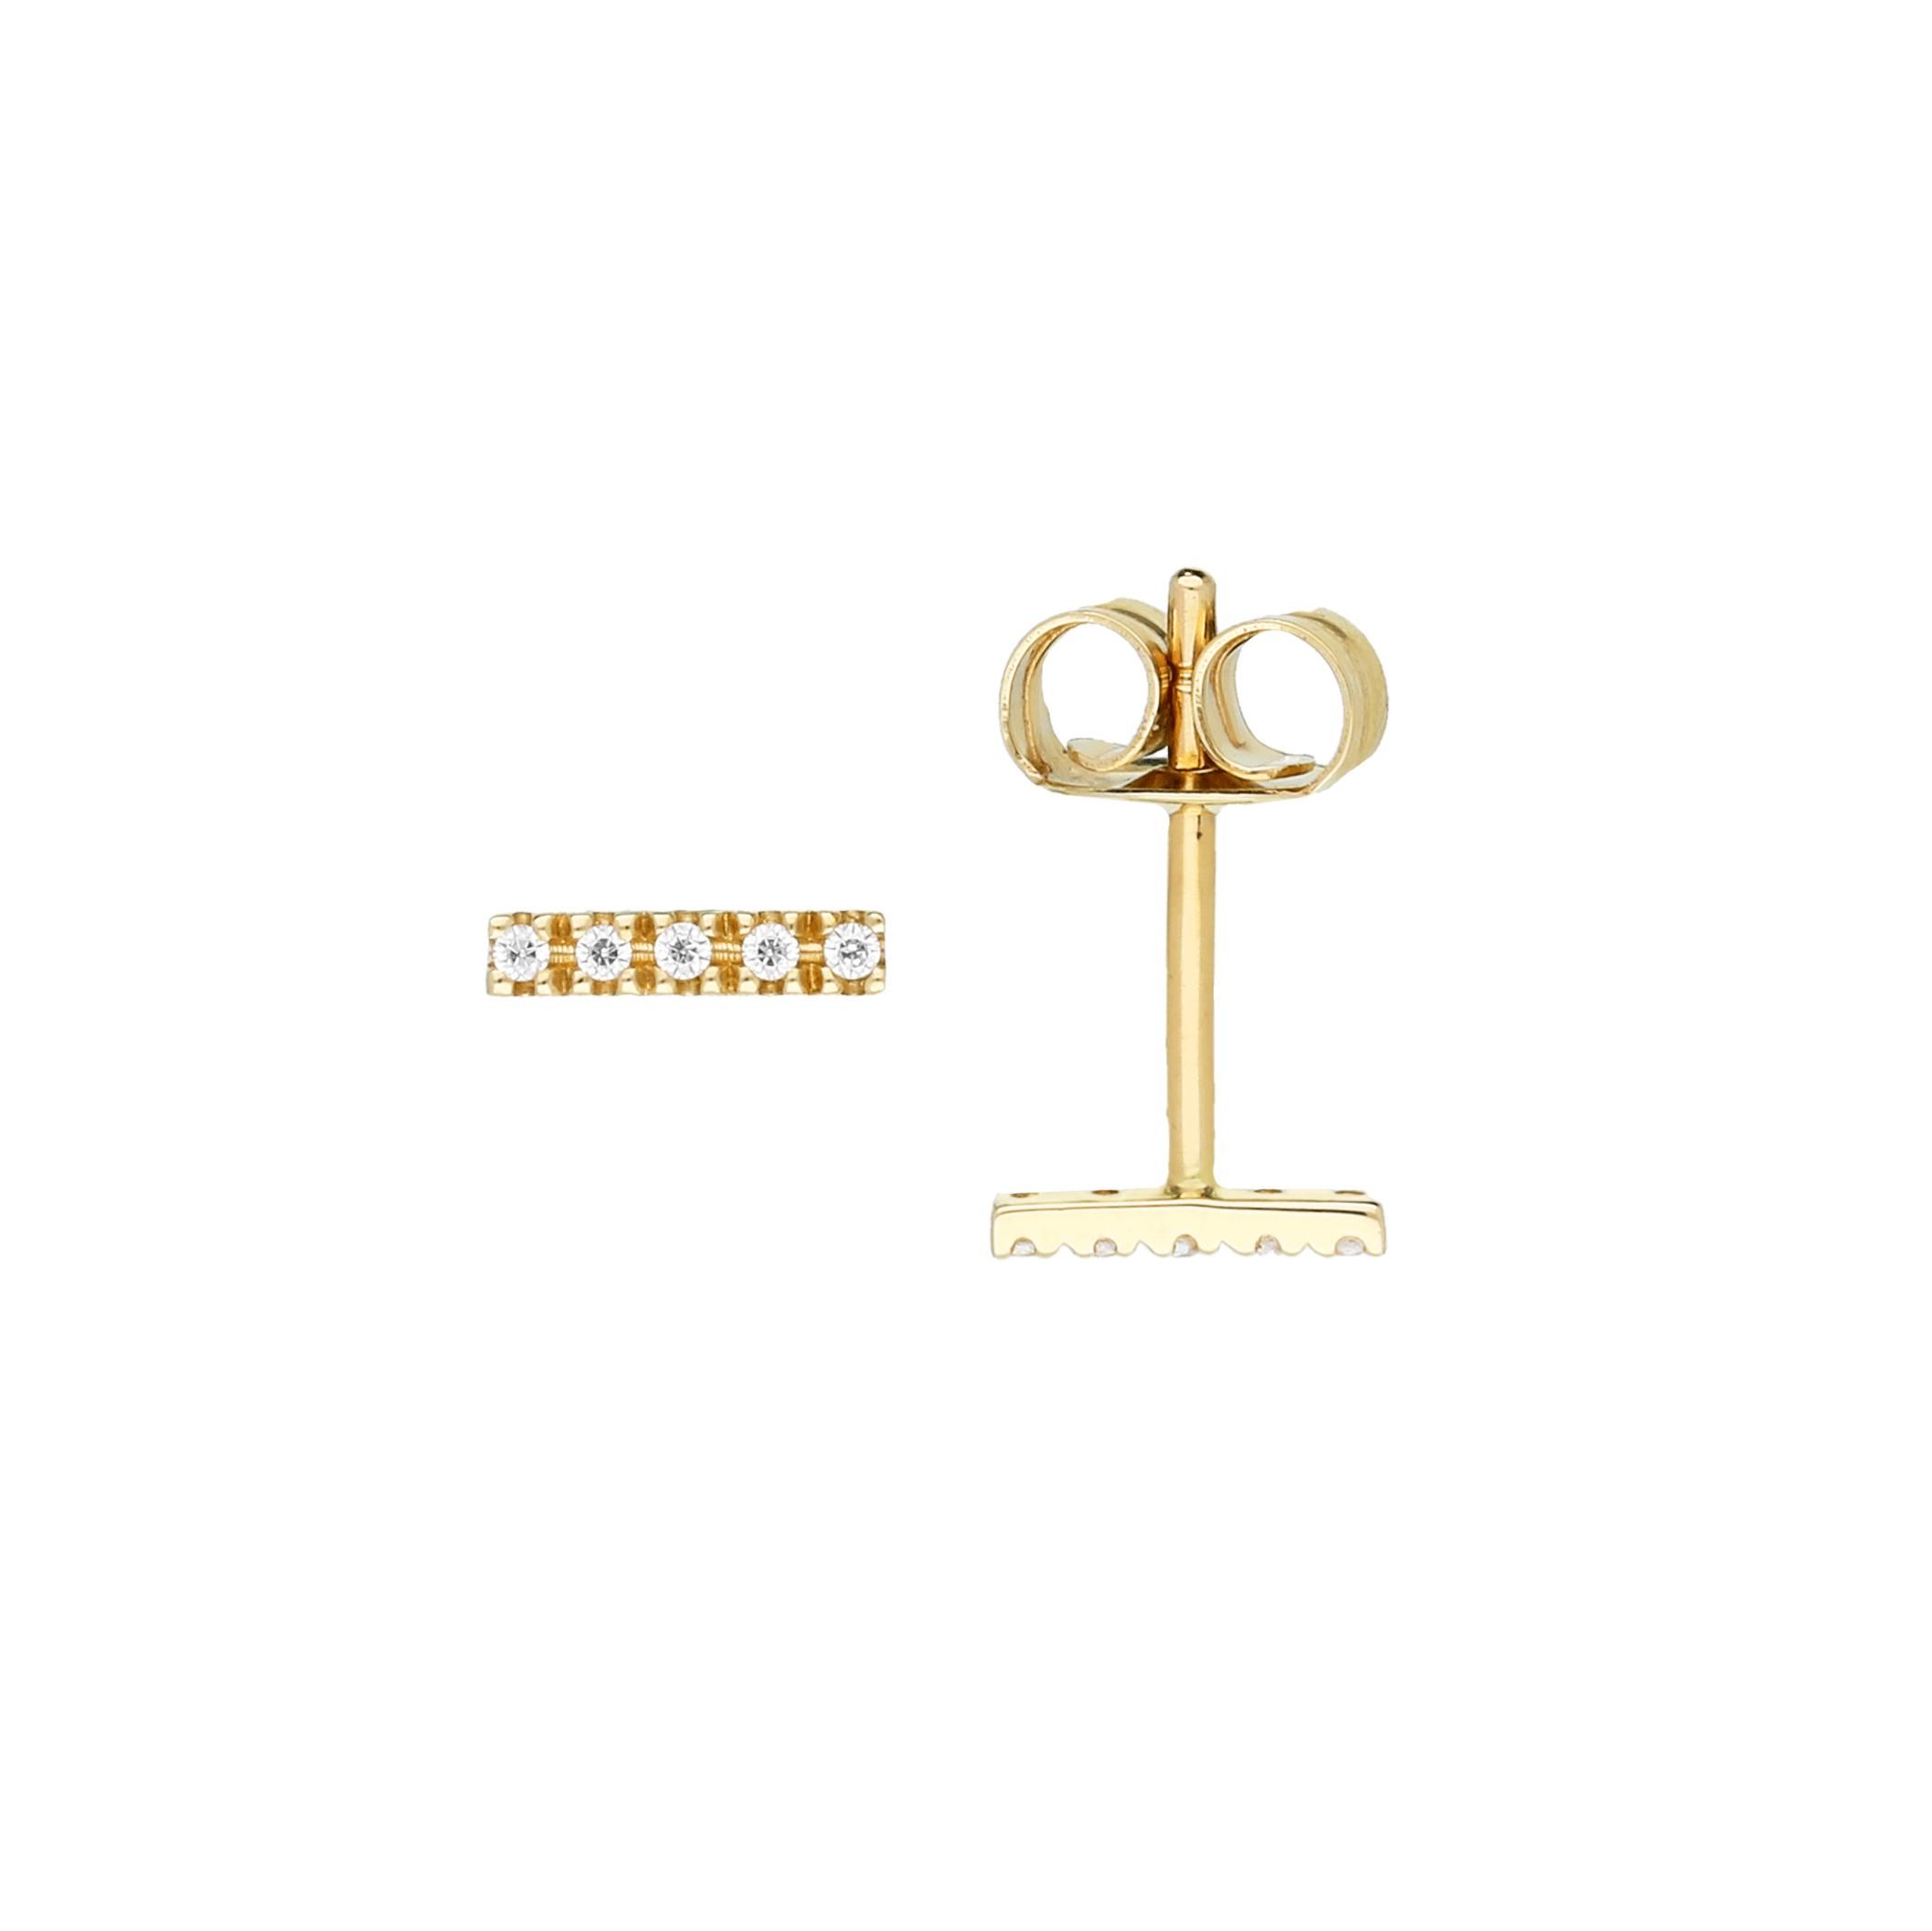 Glow Gouden Fantasieoorknoppen Gold Collection Staafjes - Zirkonia 206.2035.00